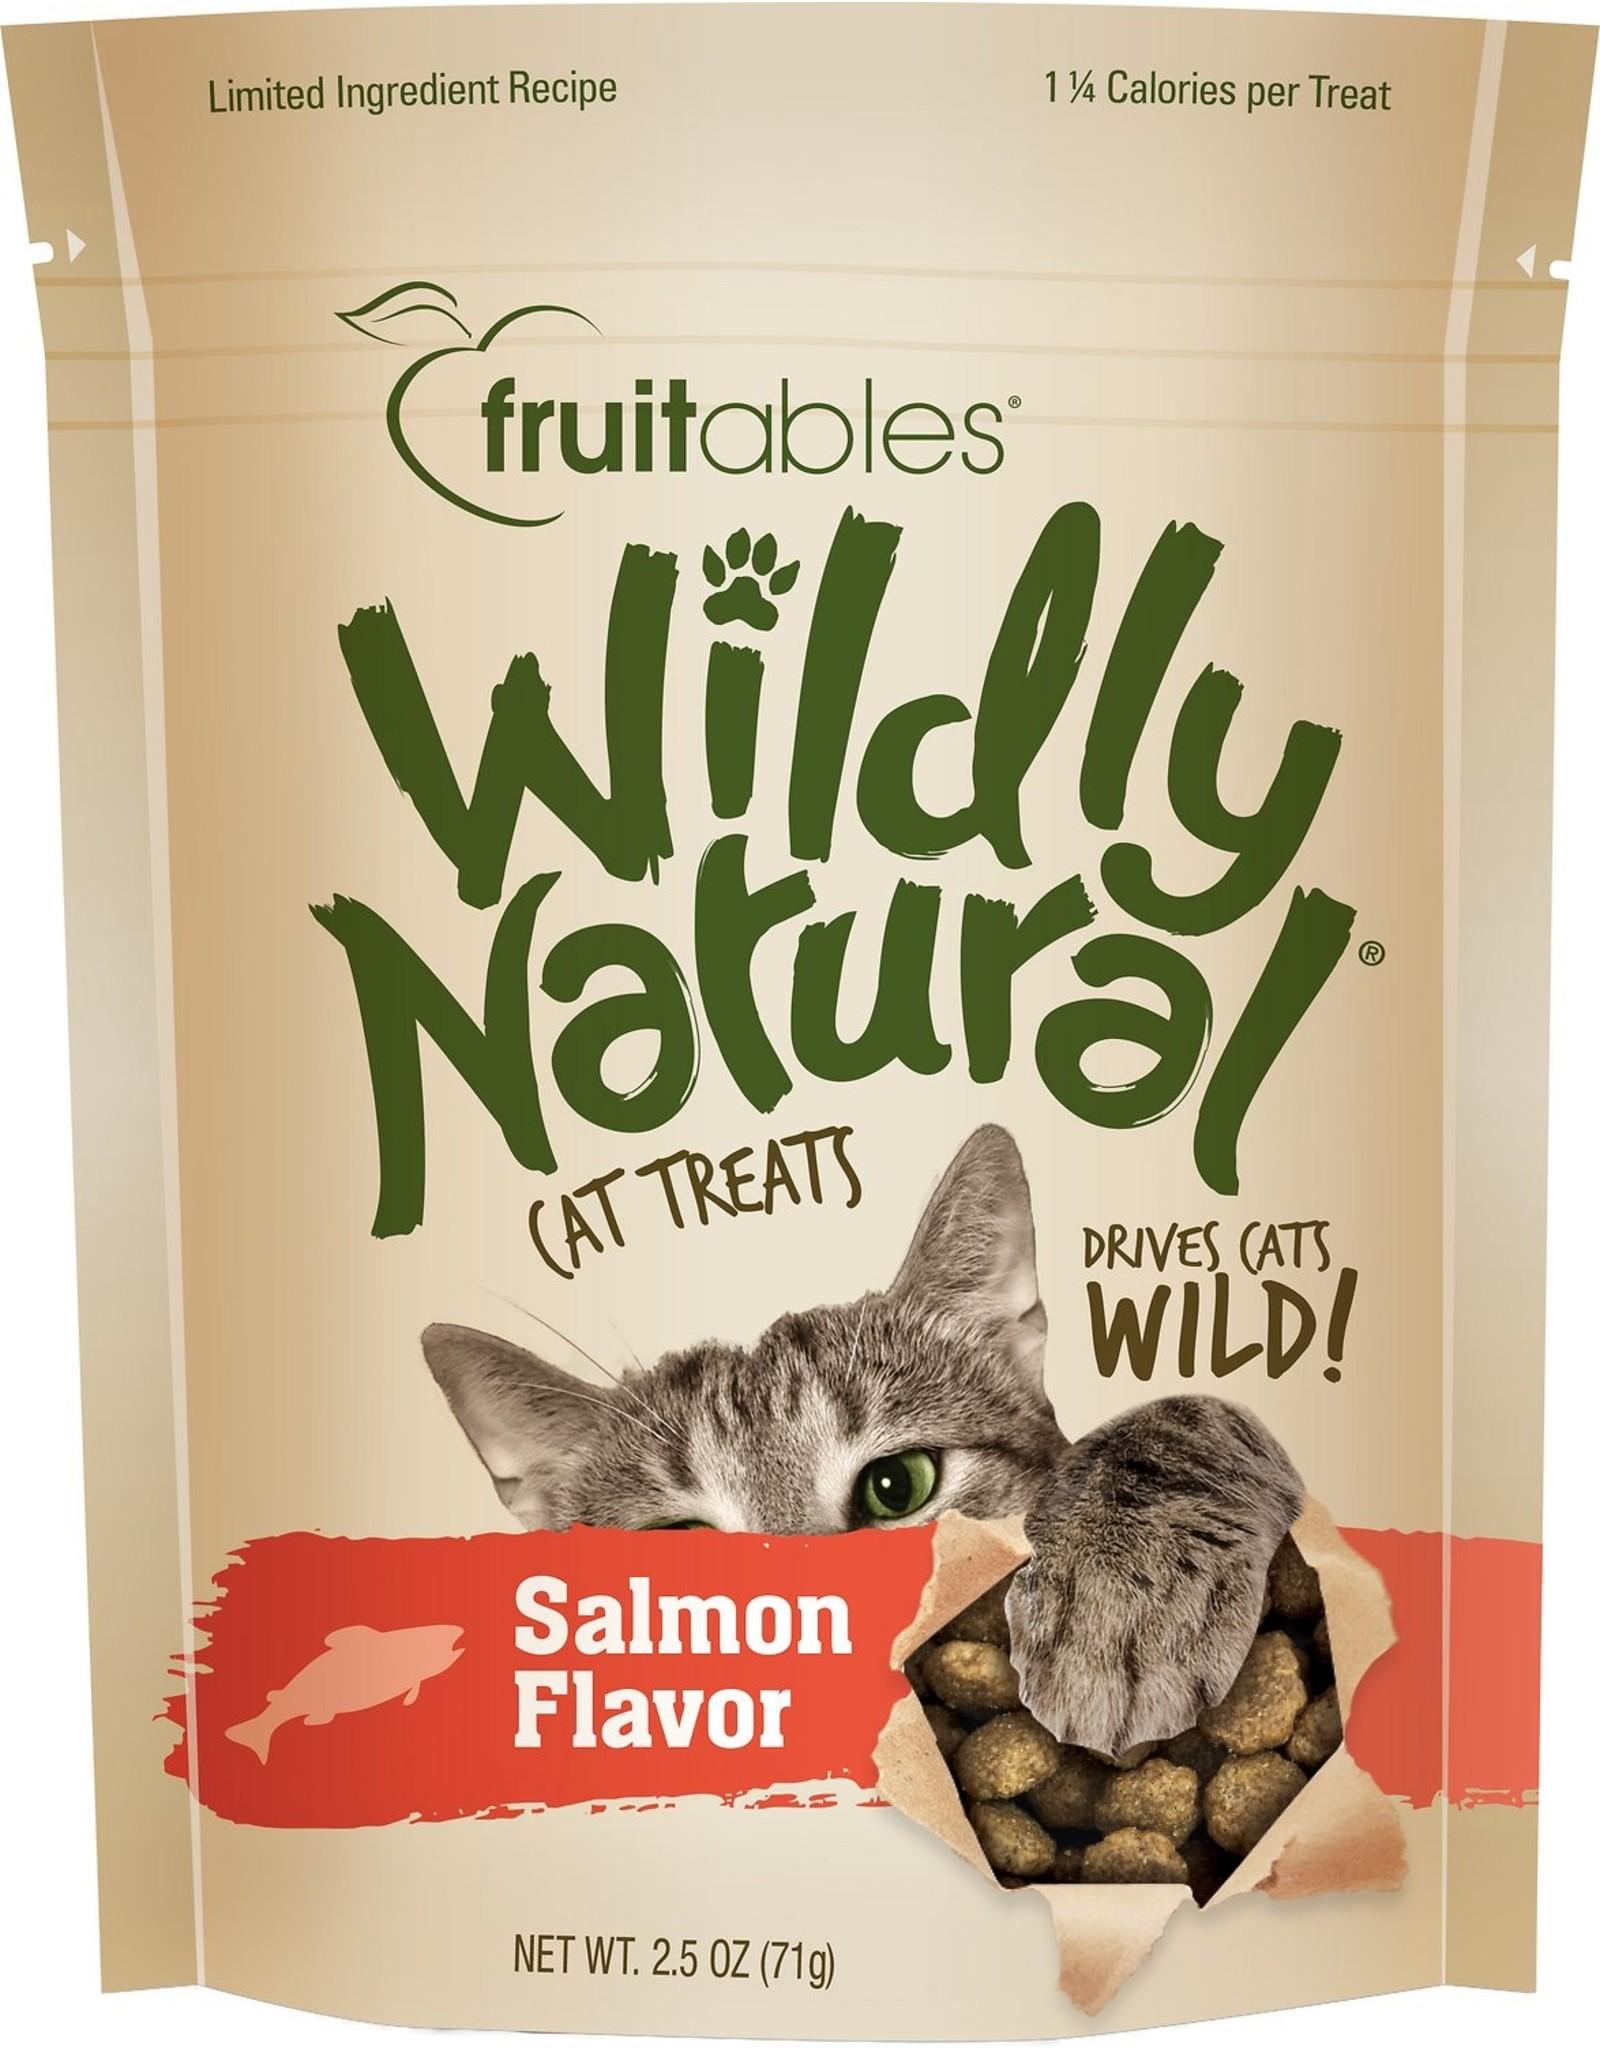 Fruitables Fruitables Wildly Natural Cat Treats 2.5oz